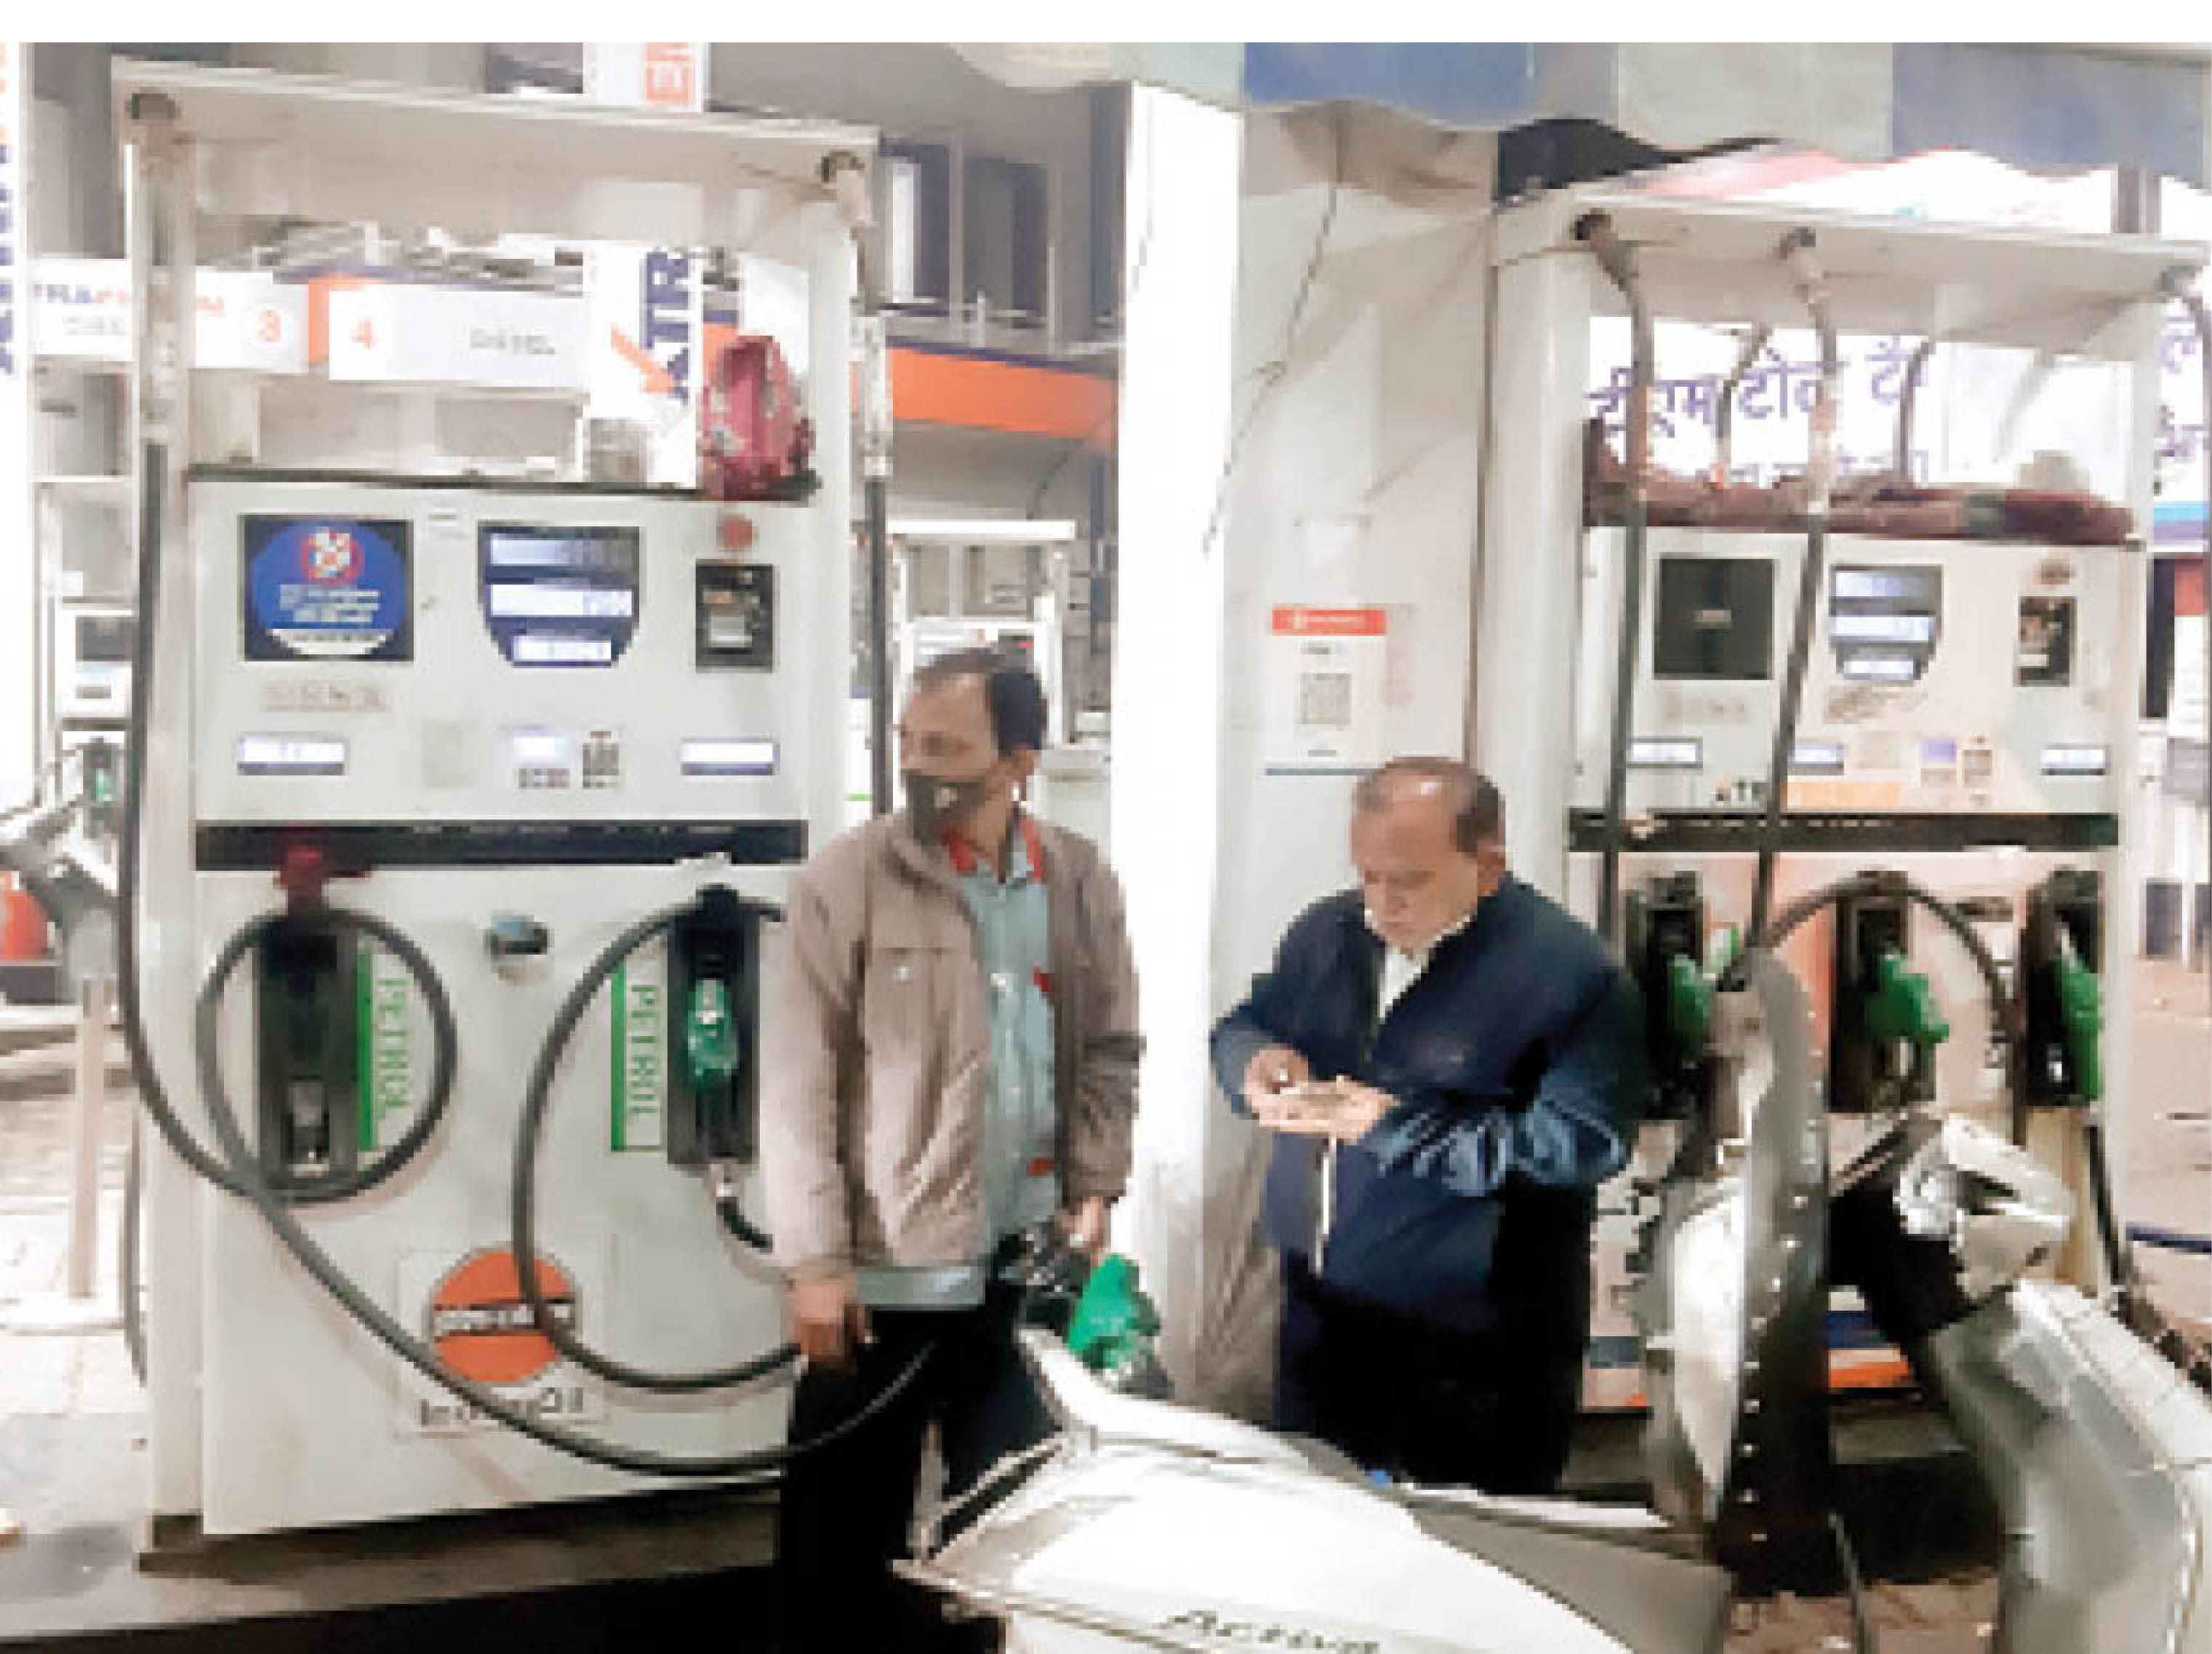 6-7 किमी दूर पड़ोसी राज्य से 1 लीटर पेट्रोल-डीजल भरवाने पर बच रहे 10 रुपए ग्वालियर,Gwalior - Dainik Bhaskar